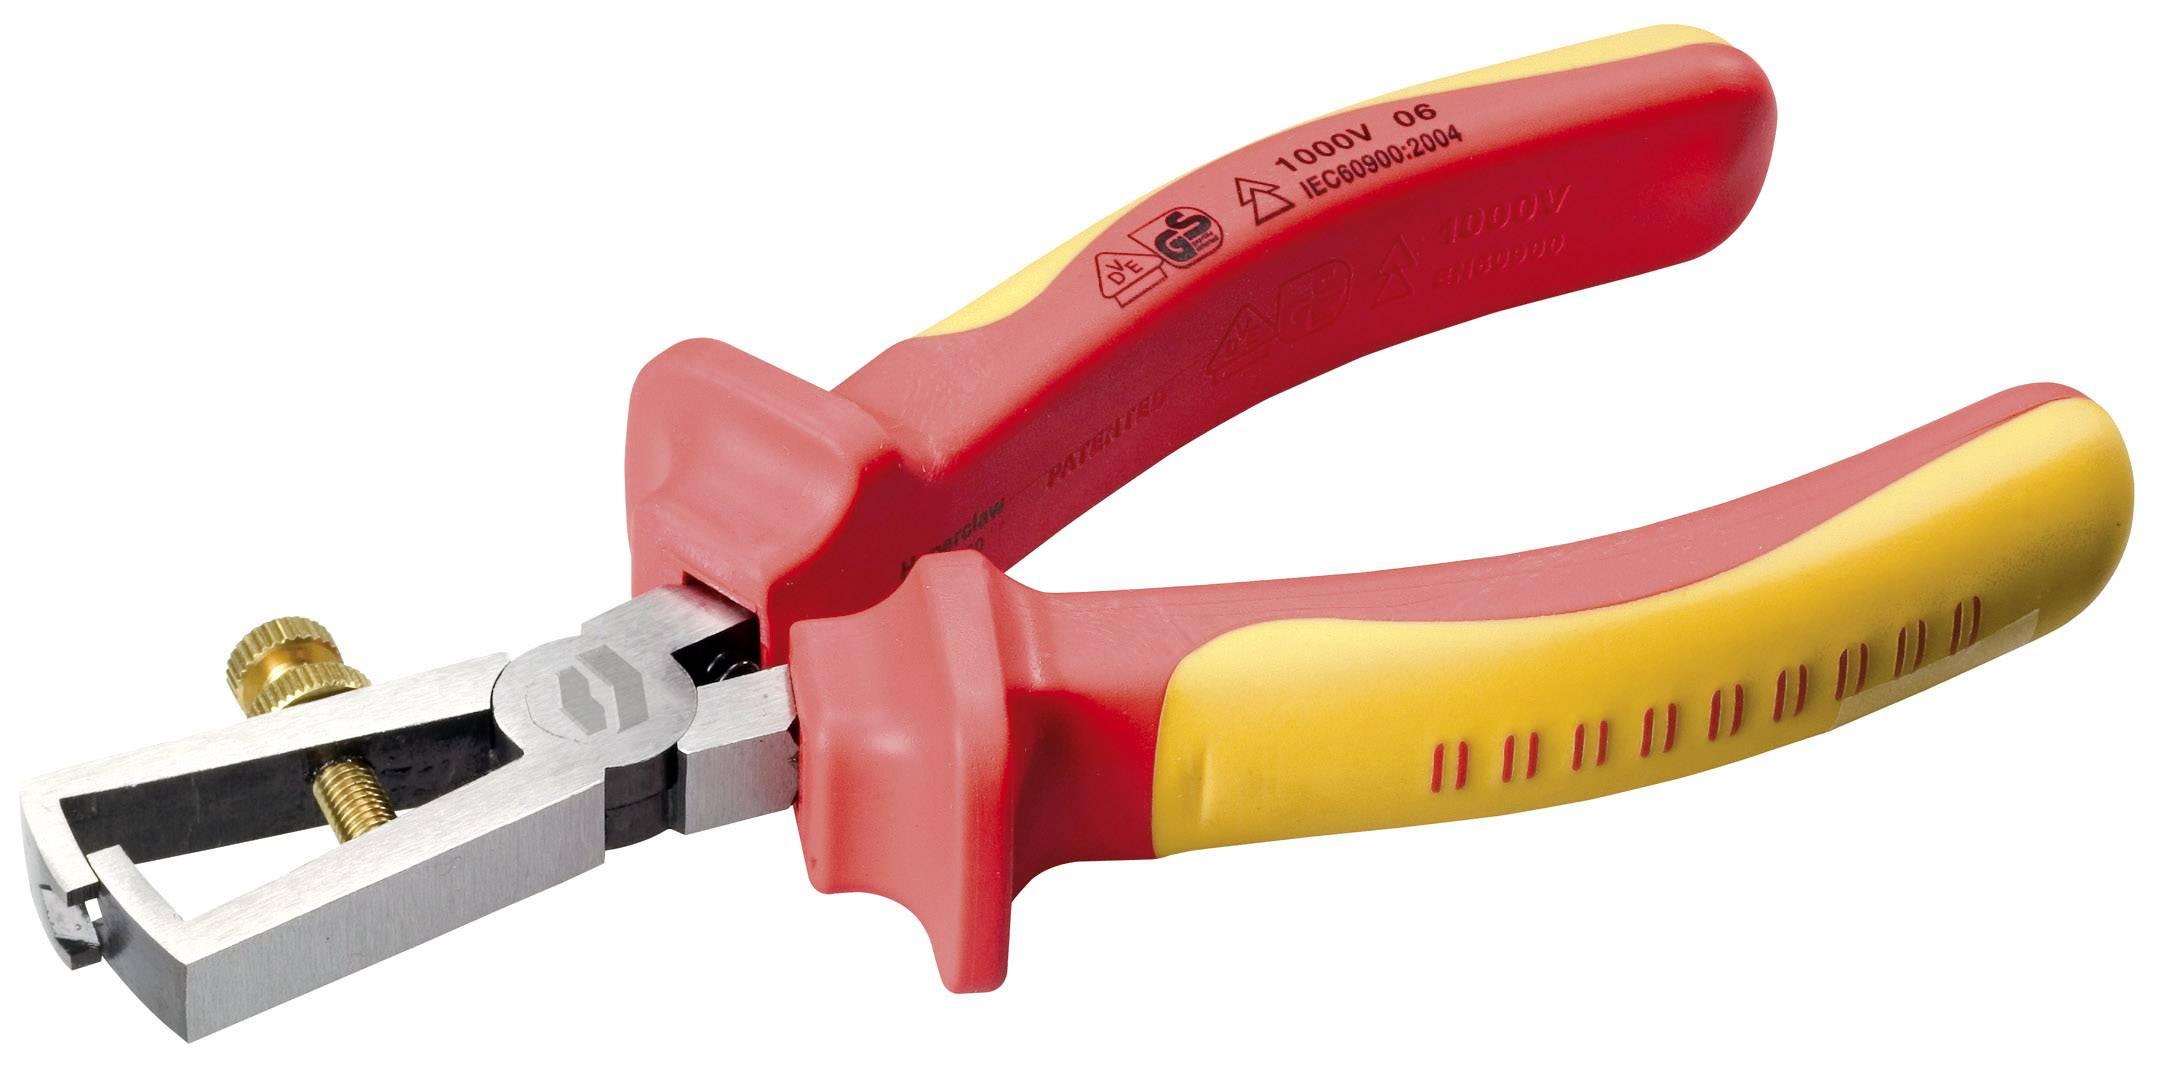 VDE odizolovacie kliešte 160 mm Toolcraft